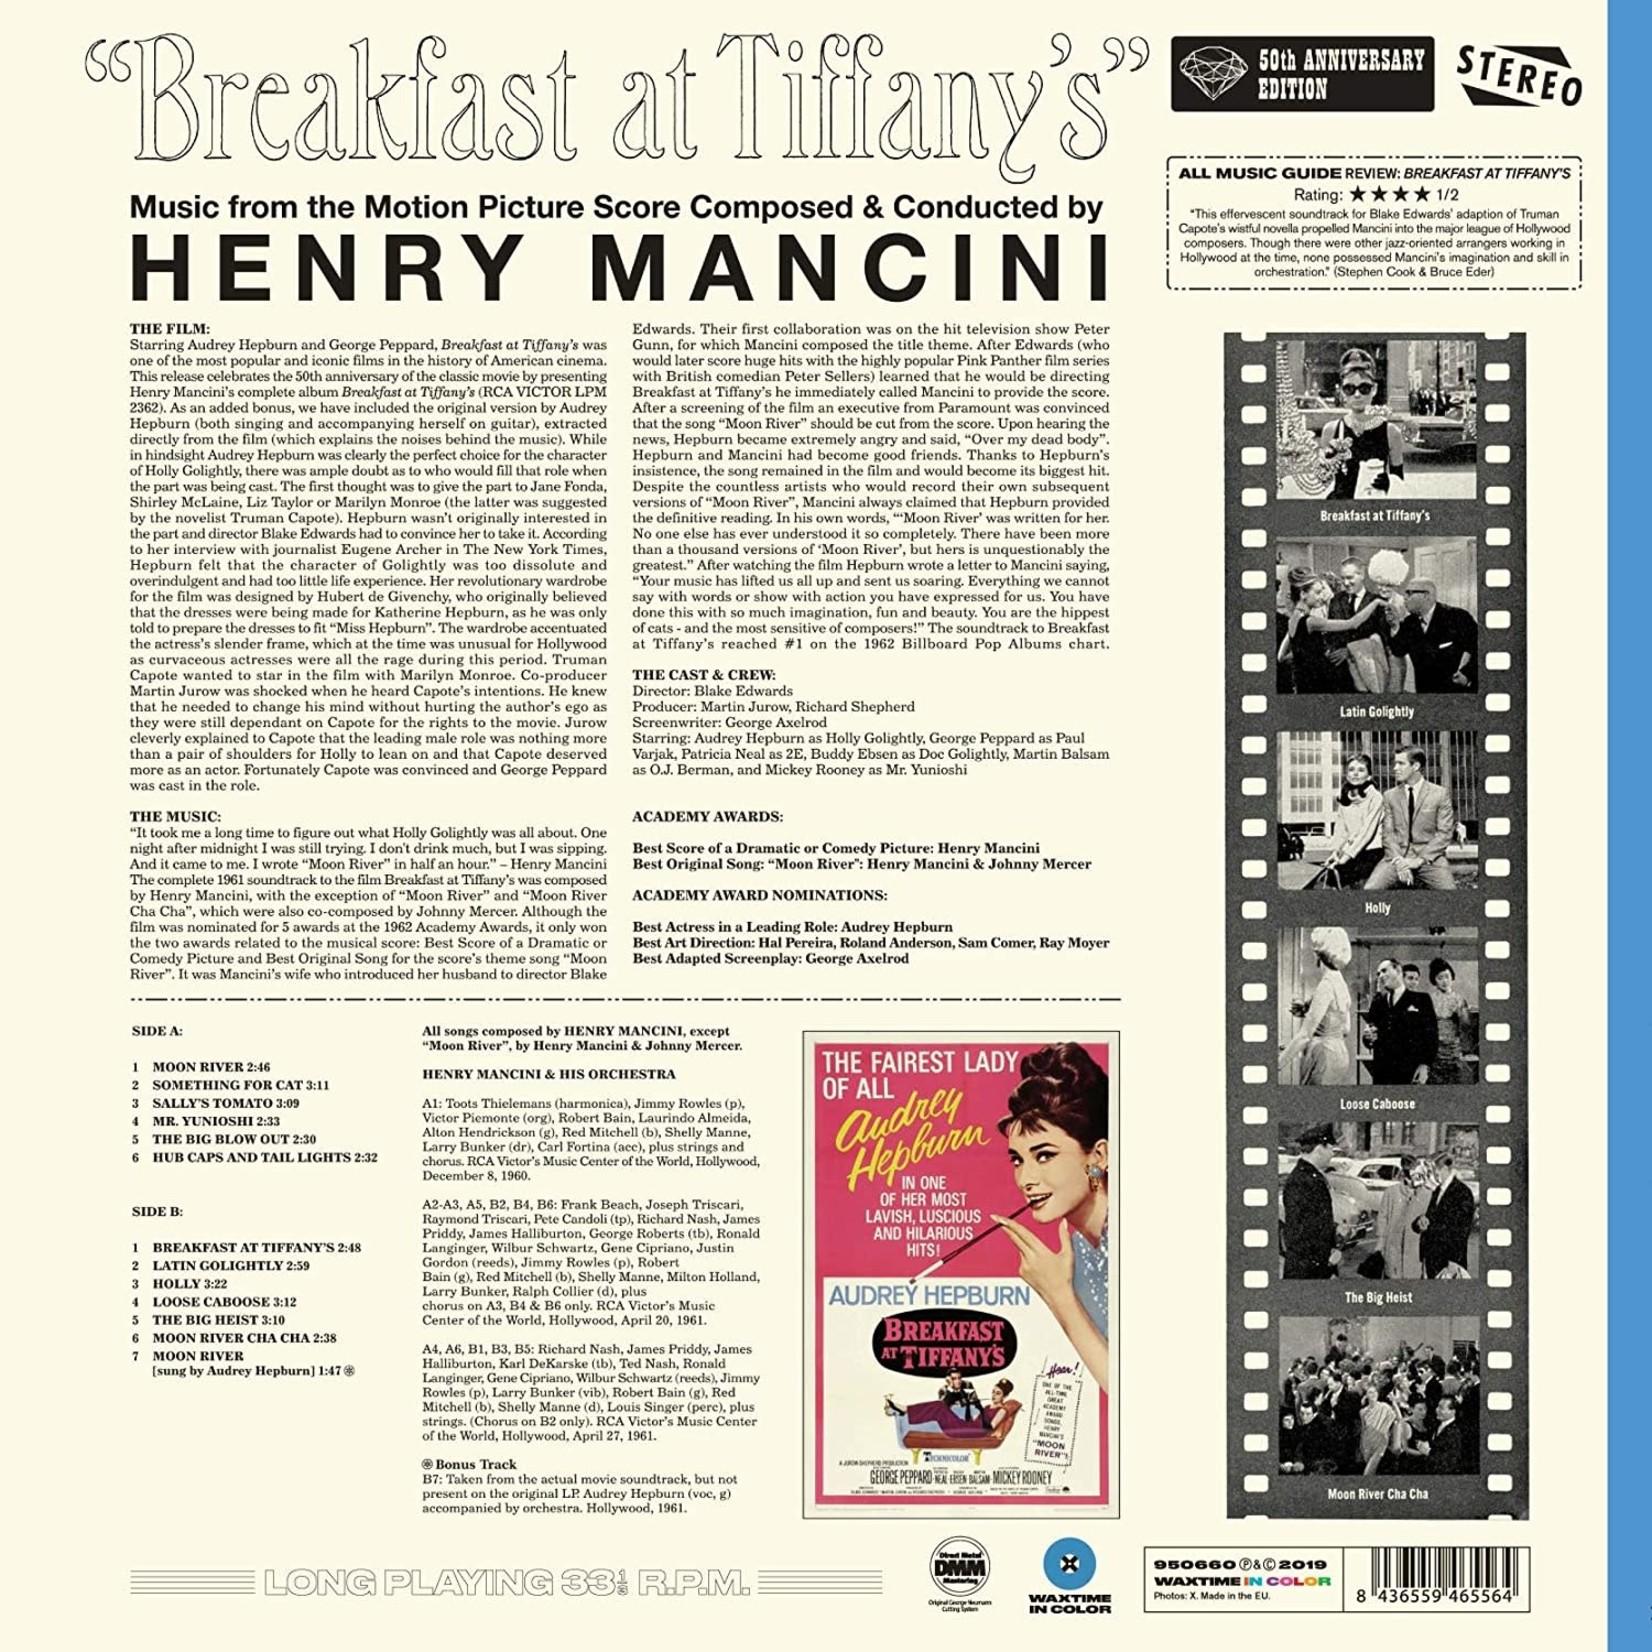 HENRY MANCINI BREAKFAST AT TIFFANY'S OST +1 BONUS TRACK!